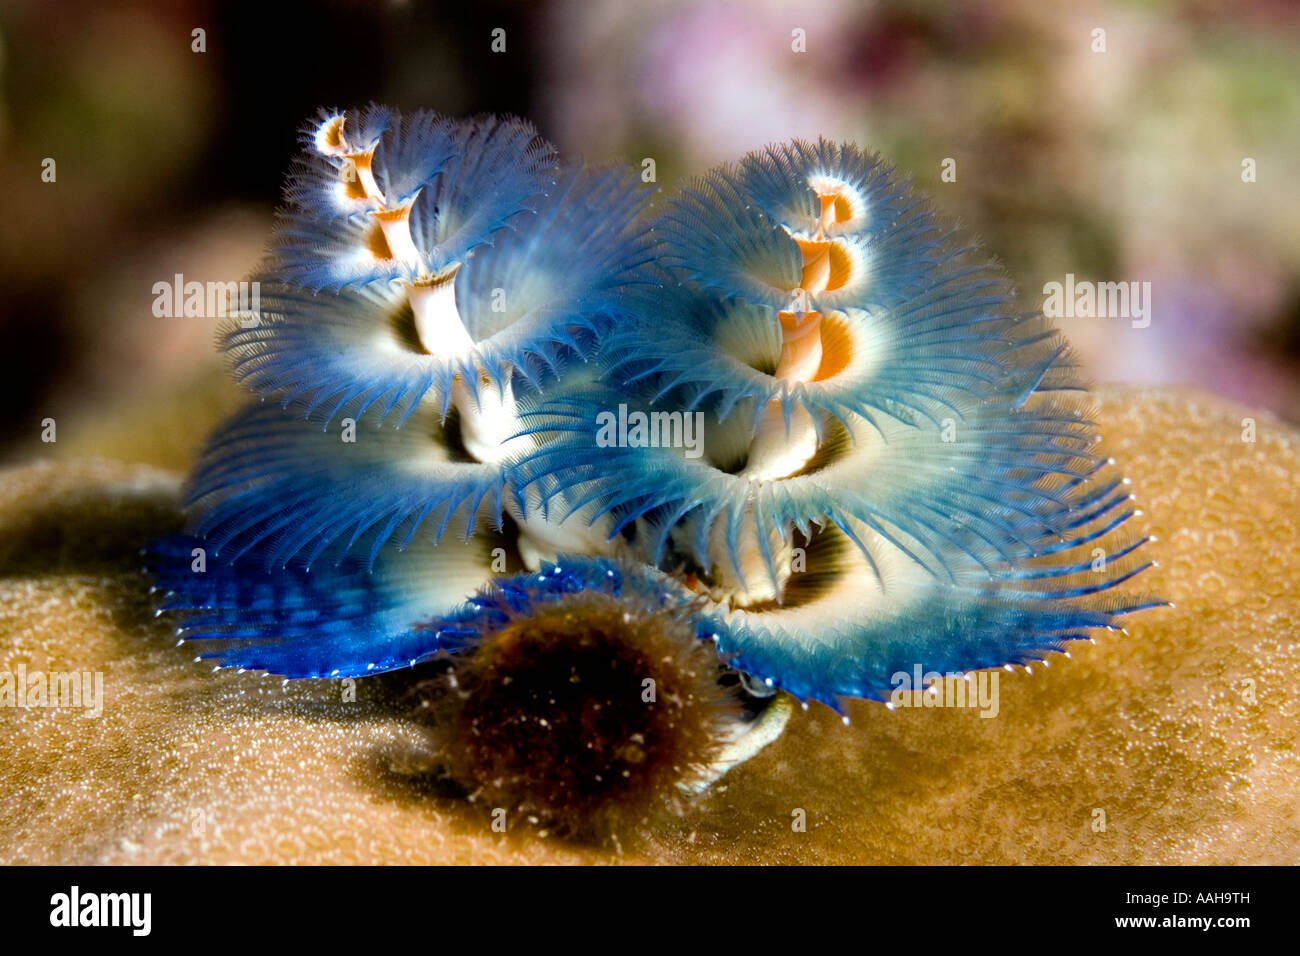 Christmas Tree Worm.Blue Tube Worm Or Christmas Tree Worm Spirobranchus